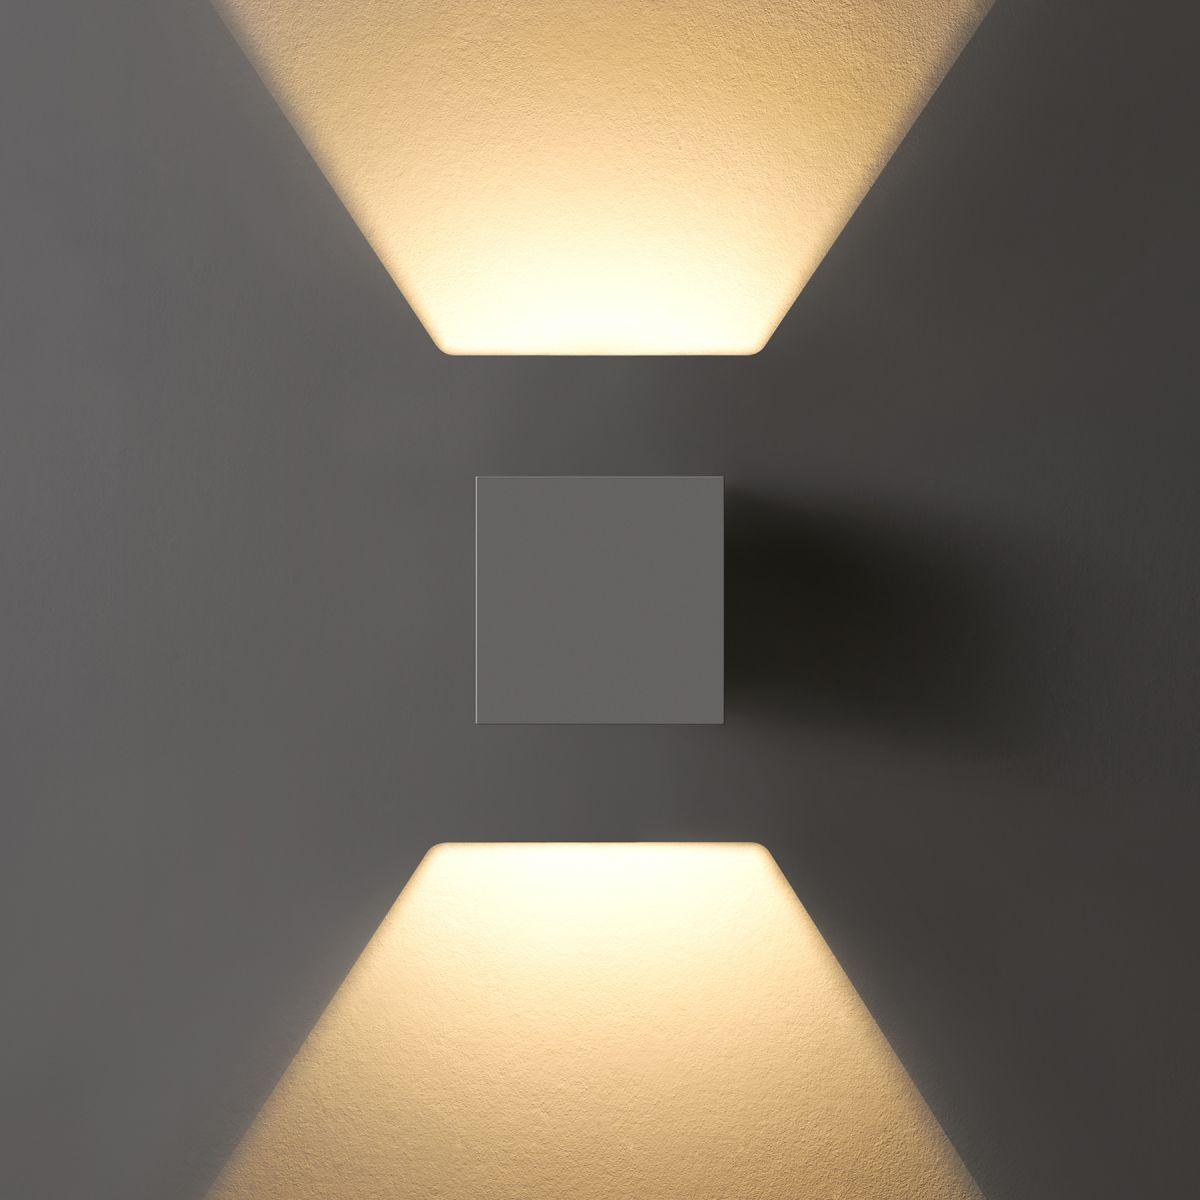 Mini DADOS Square 2 Wall Up/Down Light